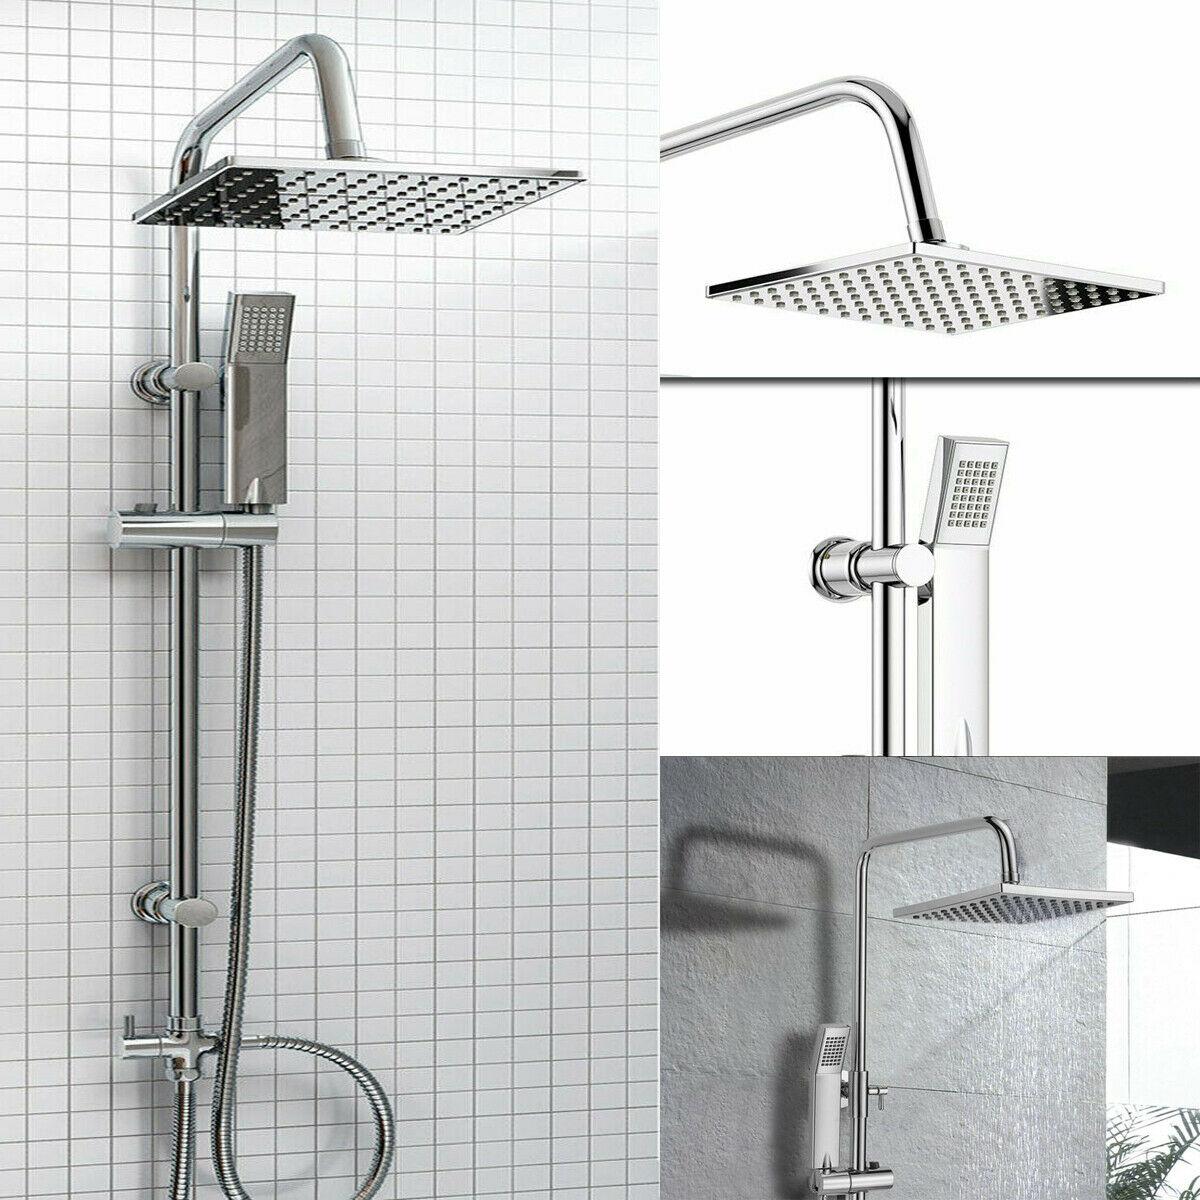 Bath Thermostatic Concealed Square Mixer Valve Shower Head Riser Rail Chrome Set